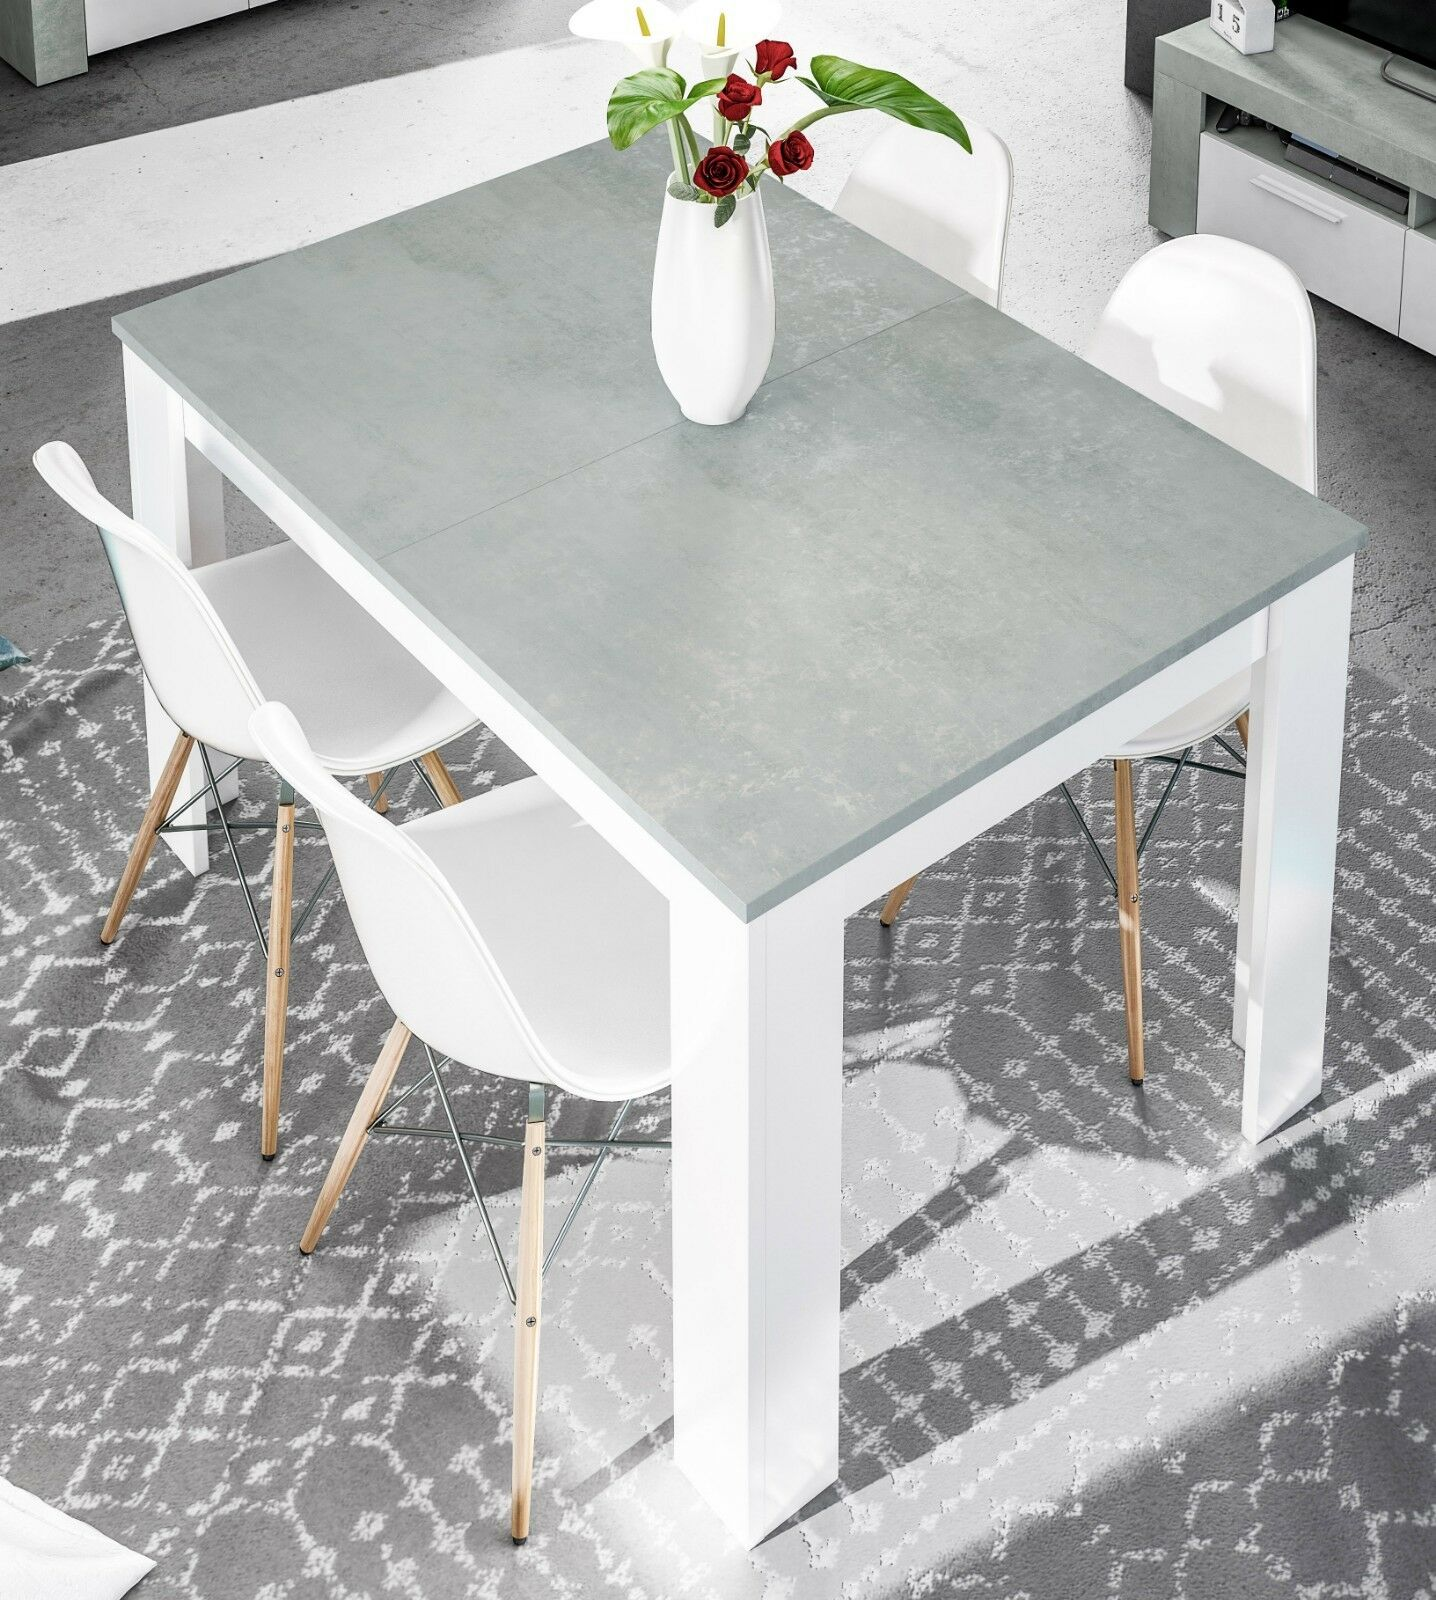 Mesa comedor extensible salon moderno color blanco y cemento 140-190x90x78 cm